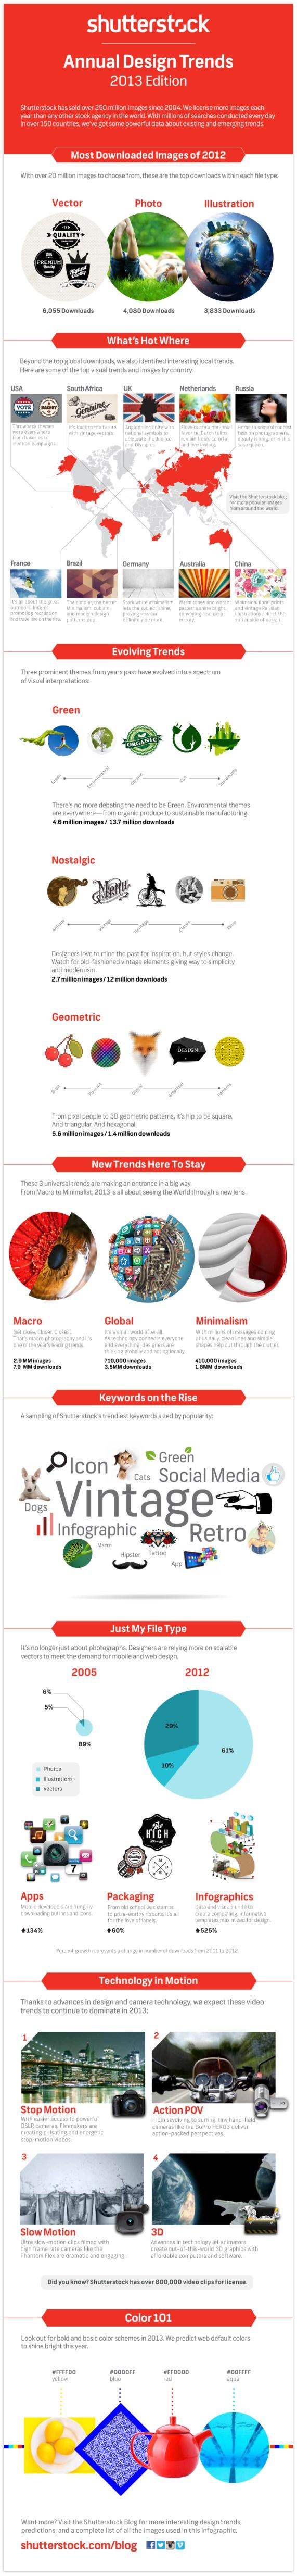 Infographic-Final-English21113_900